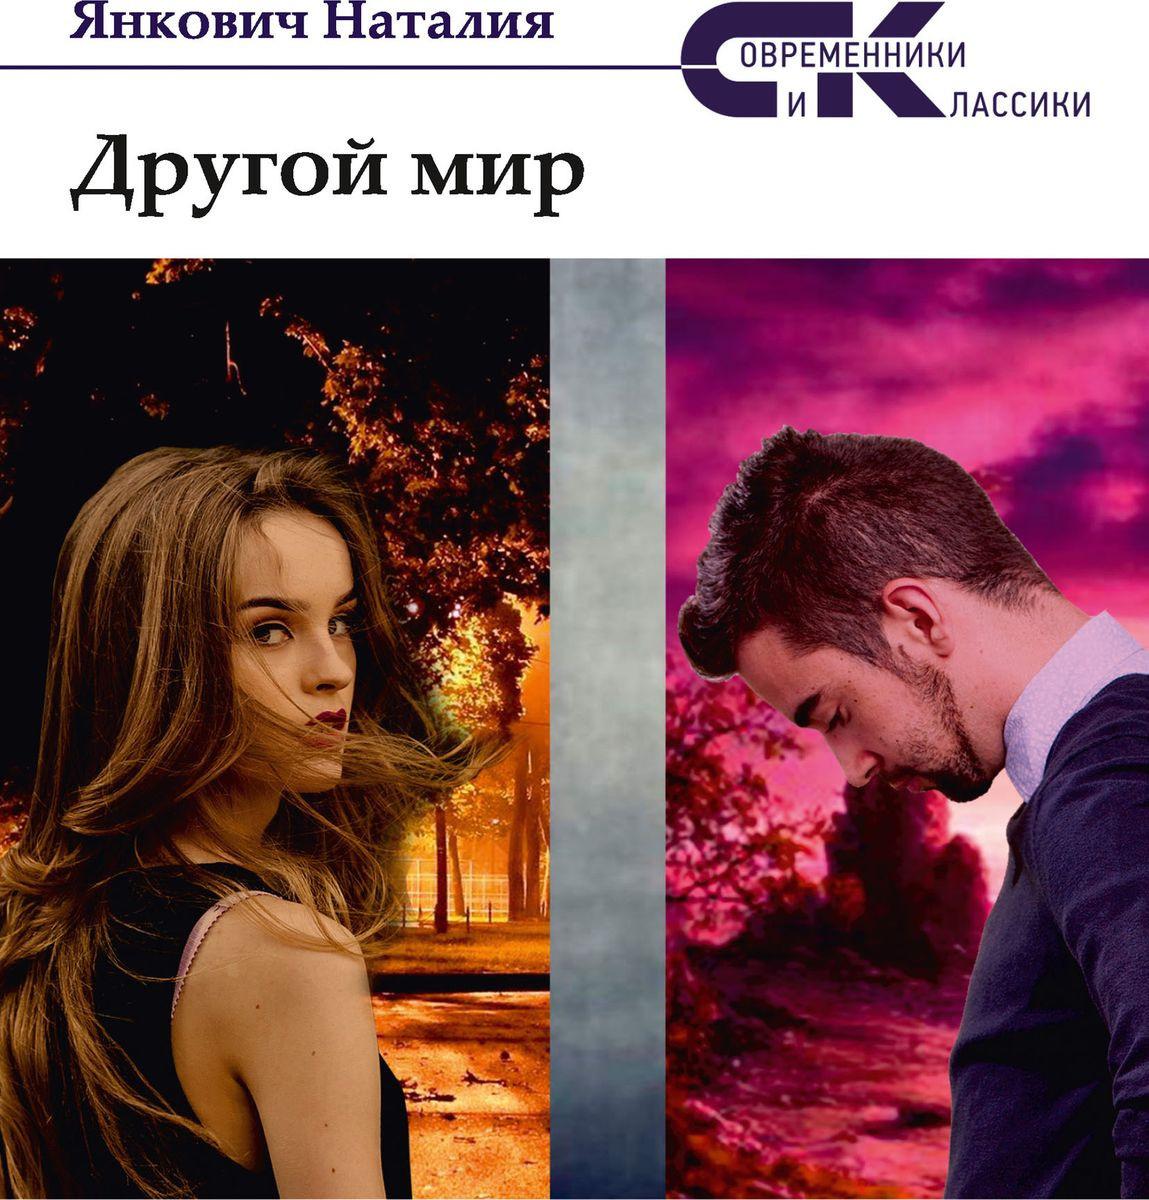 Другой мир. Том 2 | Янкович Наталия Валерьевна #1